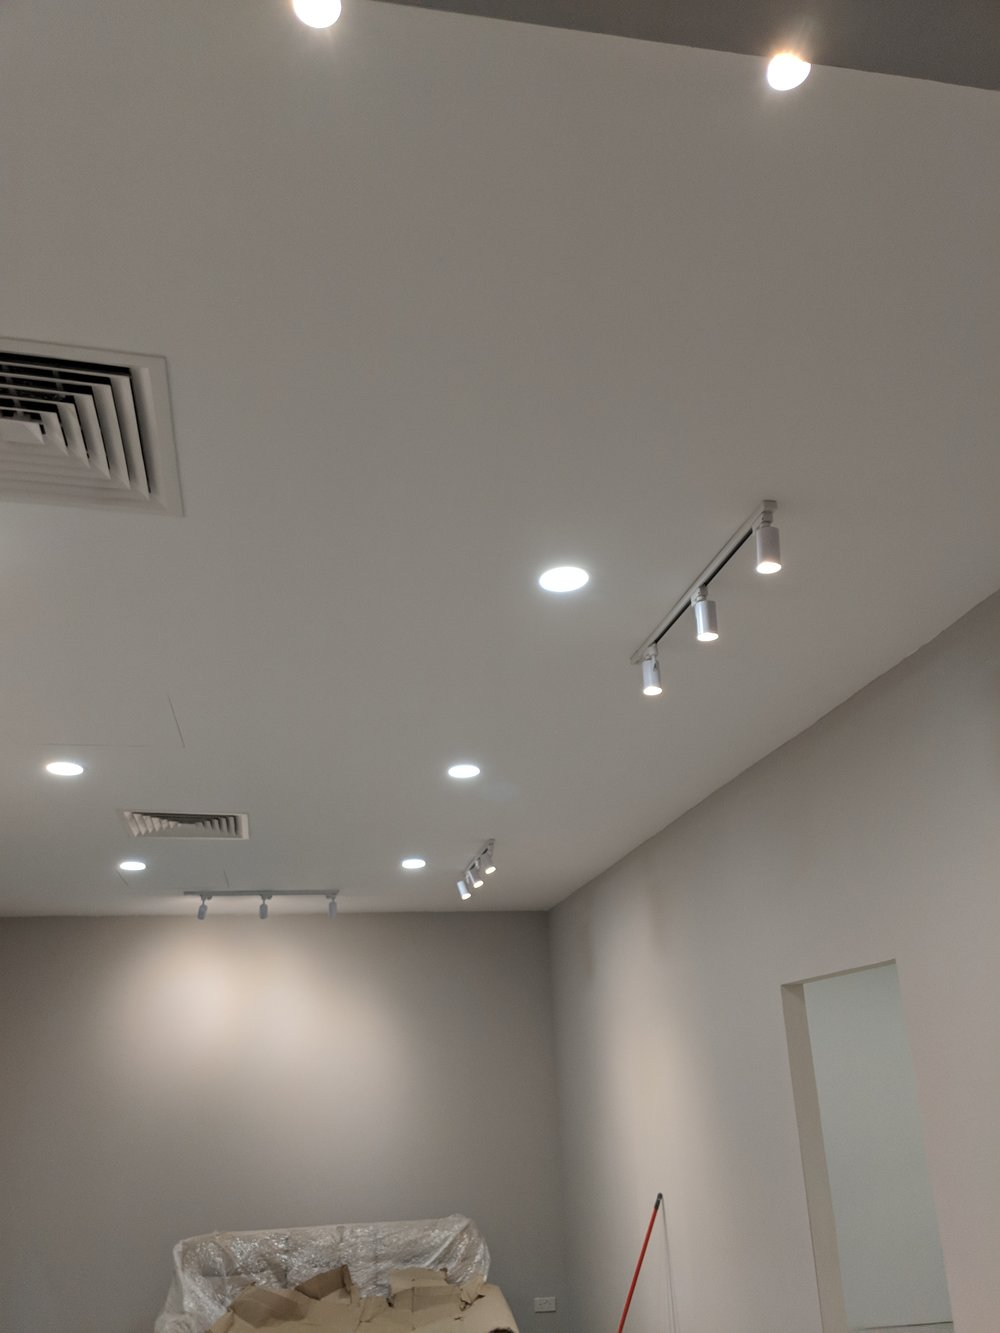 Mid June - lighting in reception area